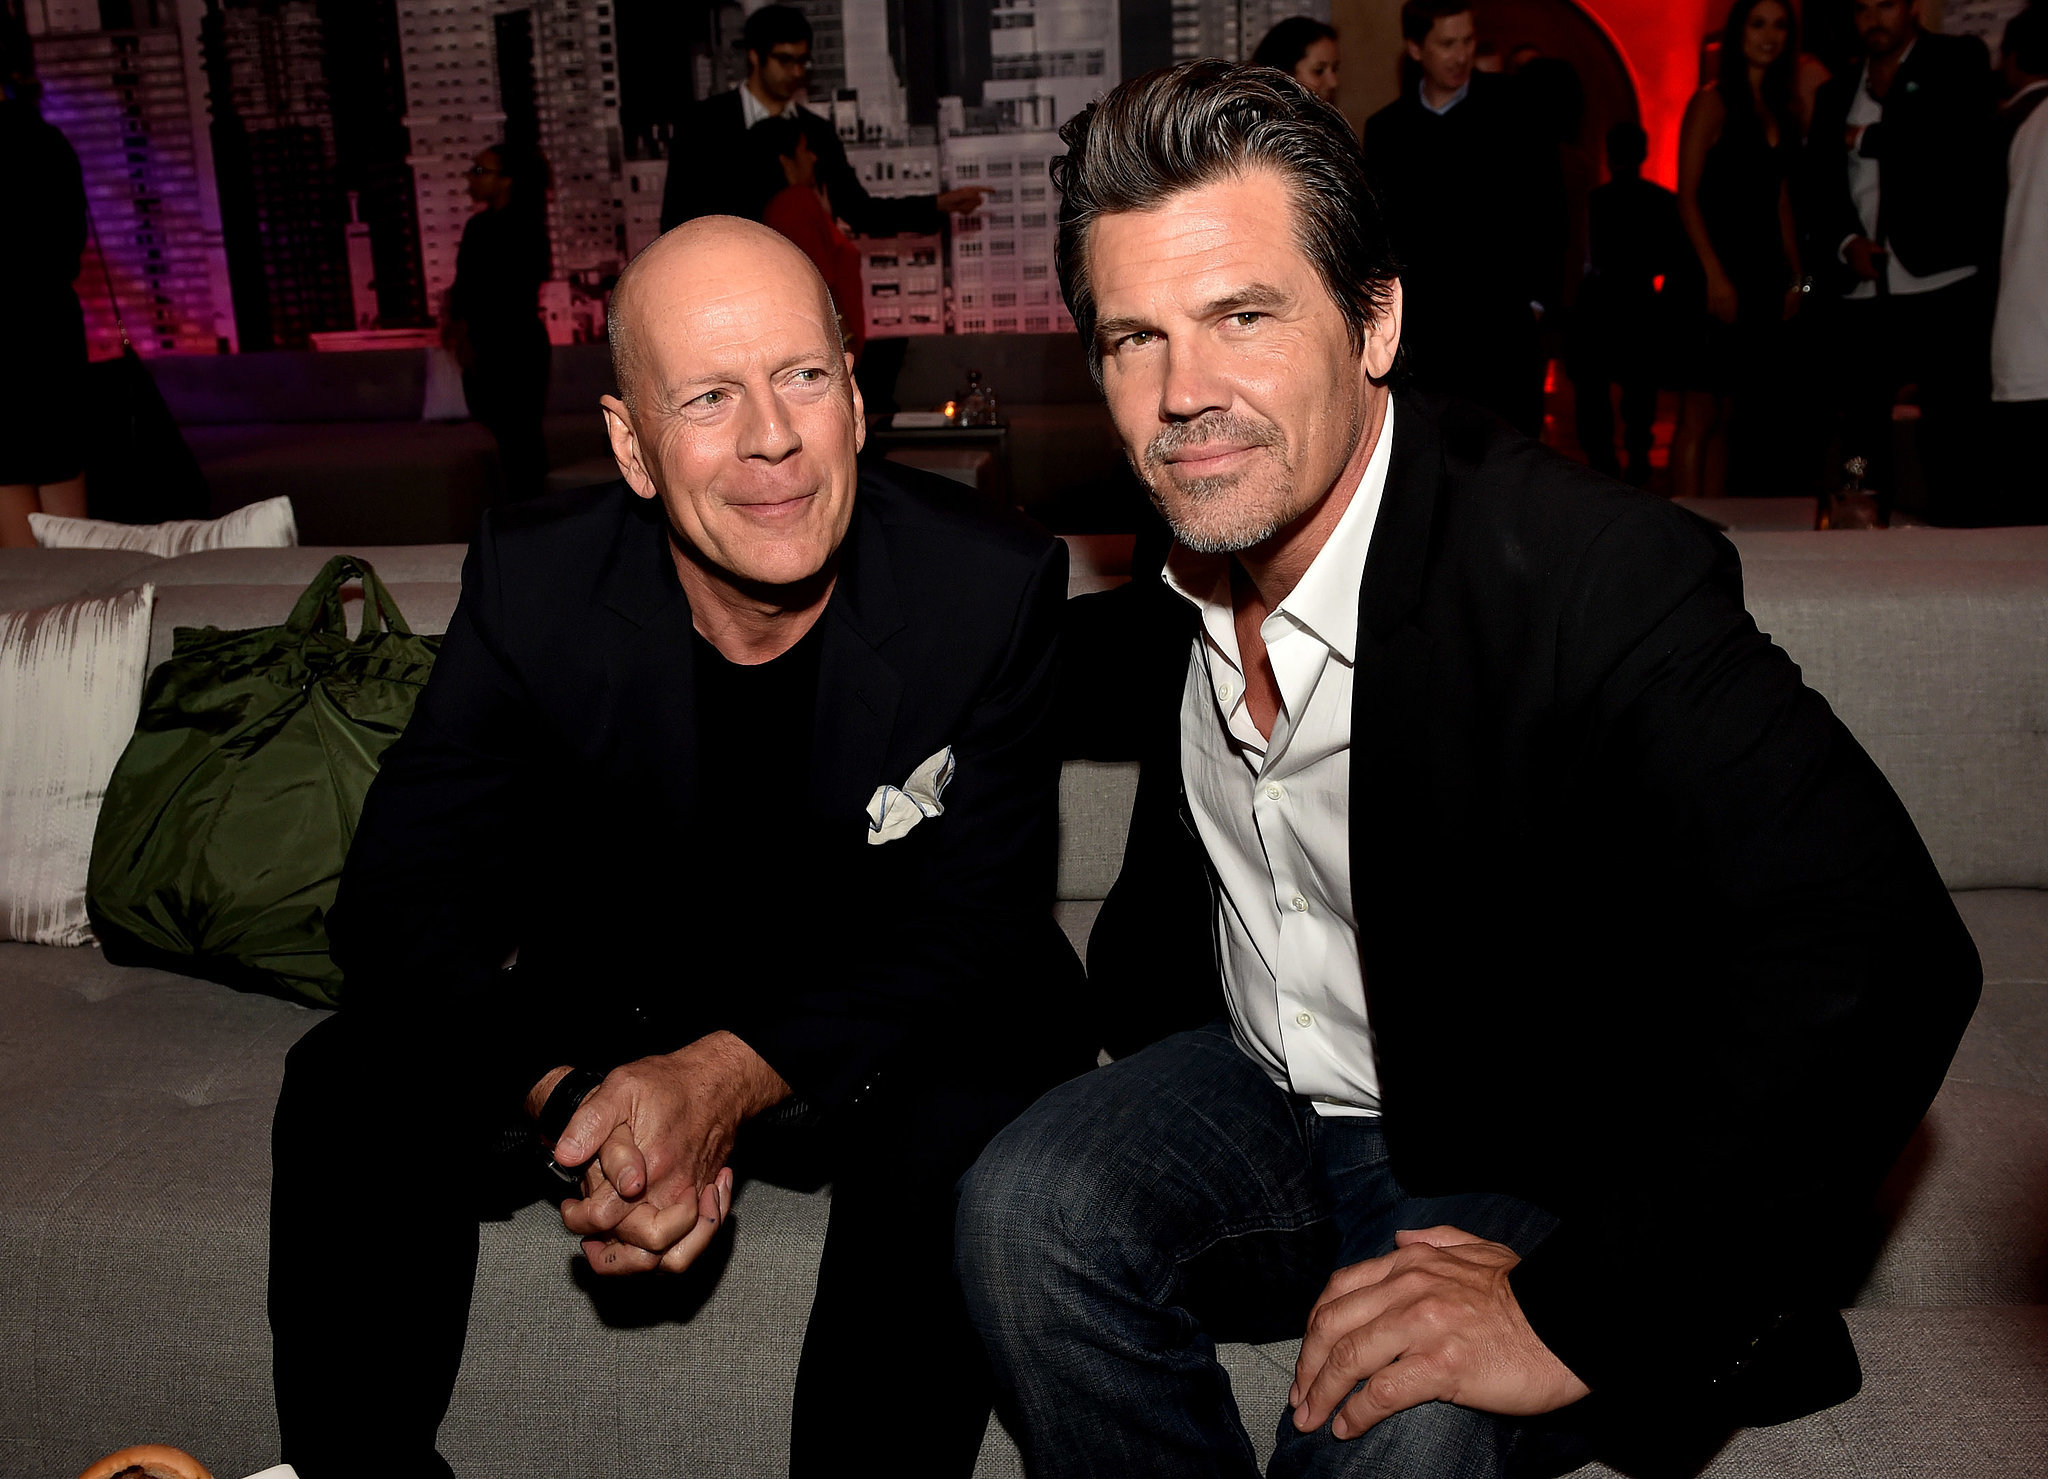 Photo of Josh Brolin & his friend actor  Bruce Willis - Sin City